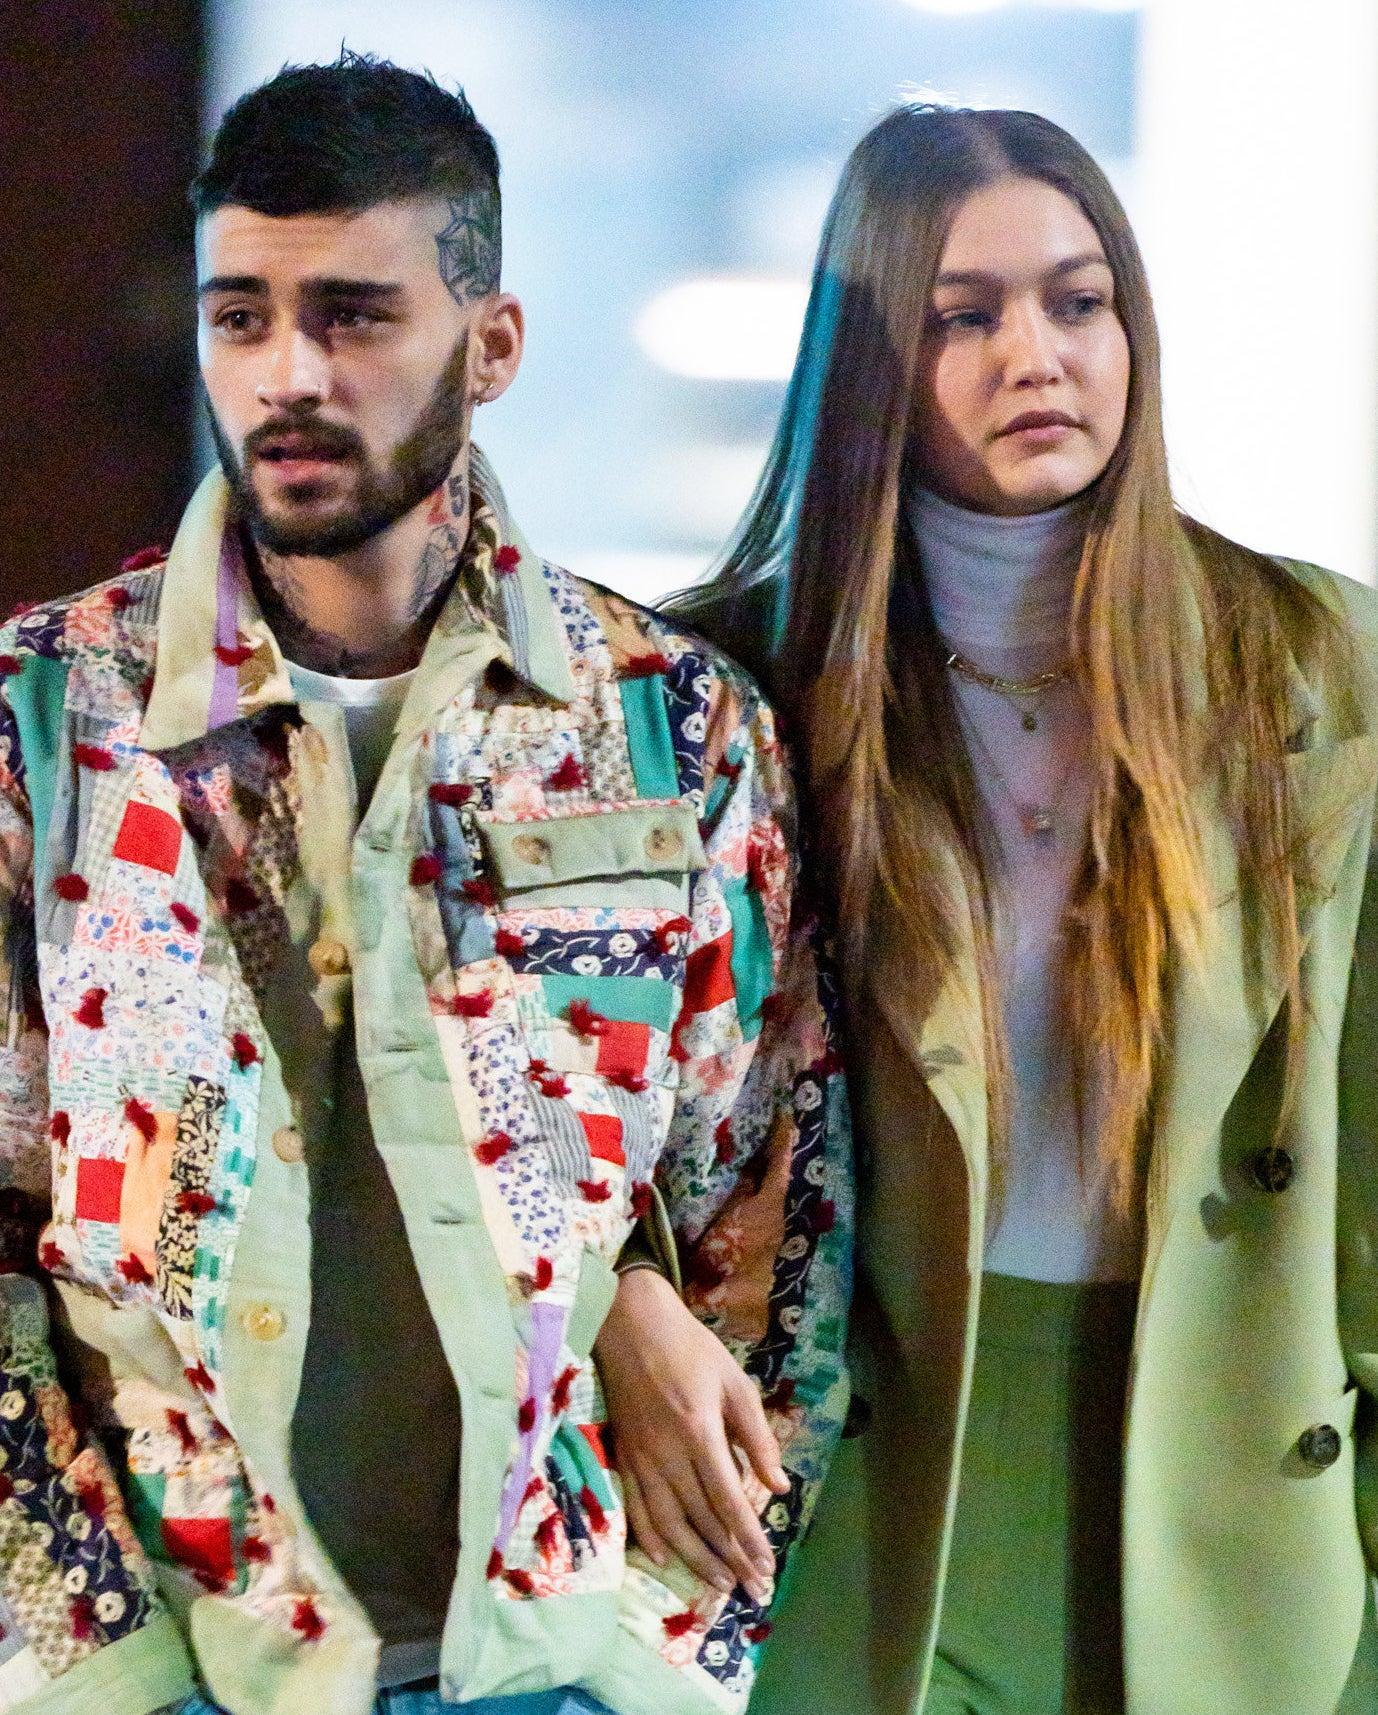 Zayn Malik and Gigi Hadid are photographed walking in New York City